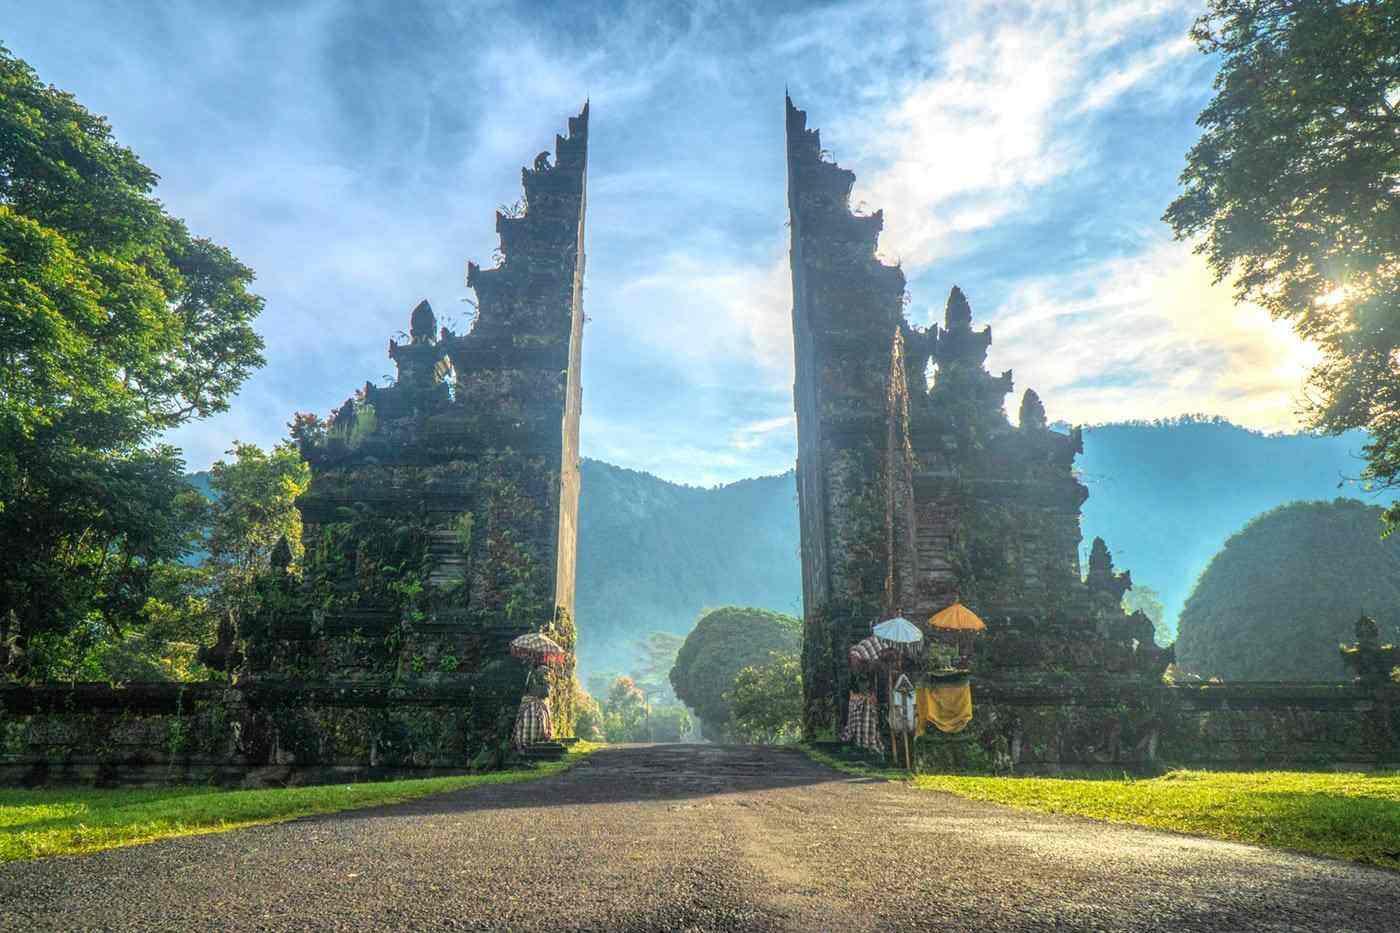 handara gate, bali - 7 best tropical islands to visit